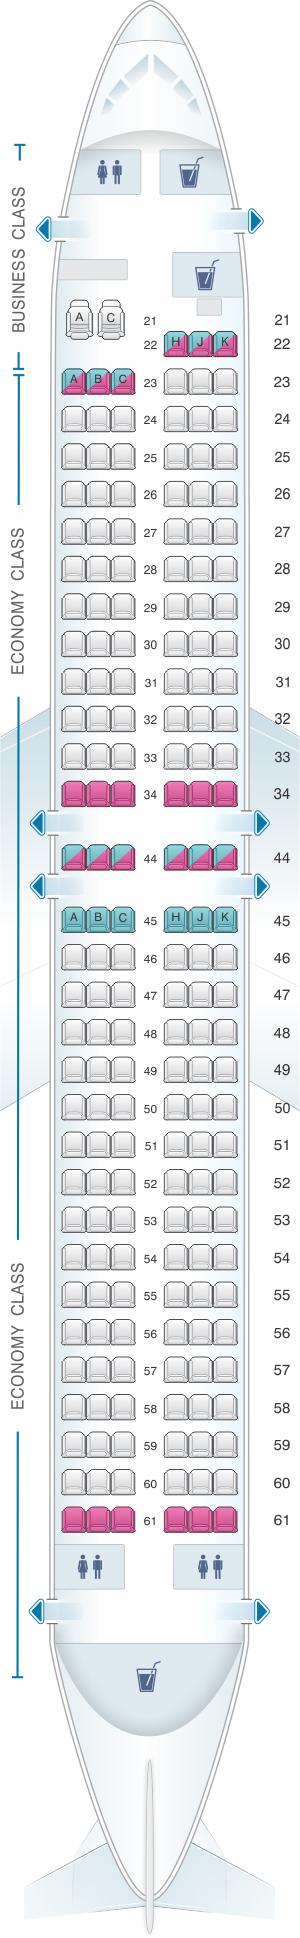 Seat map for El Al Israel Airlines Boeing B737 800 185pax